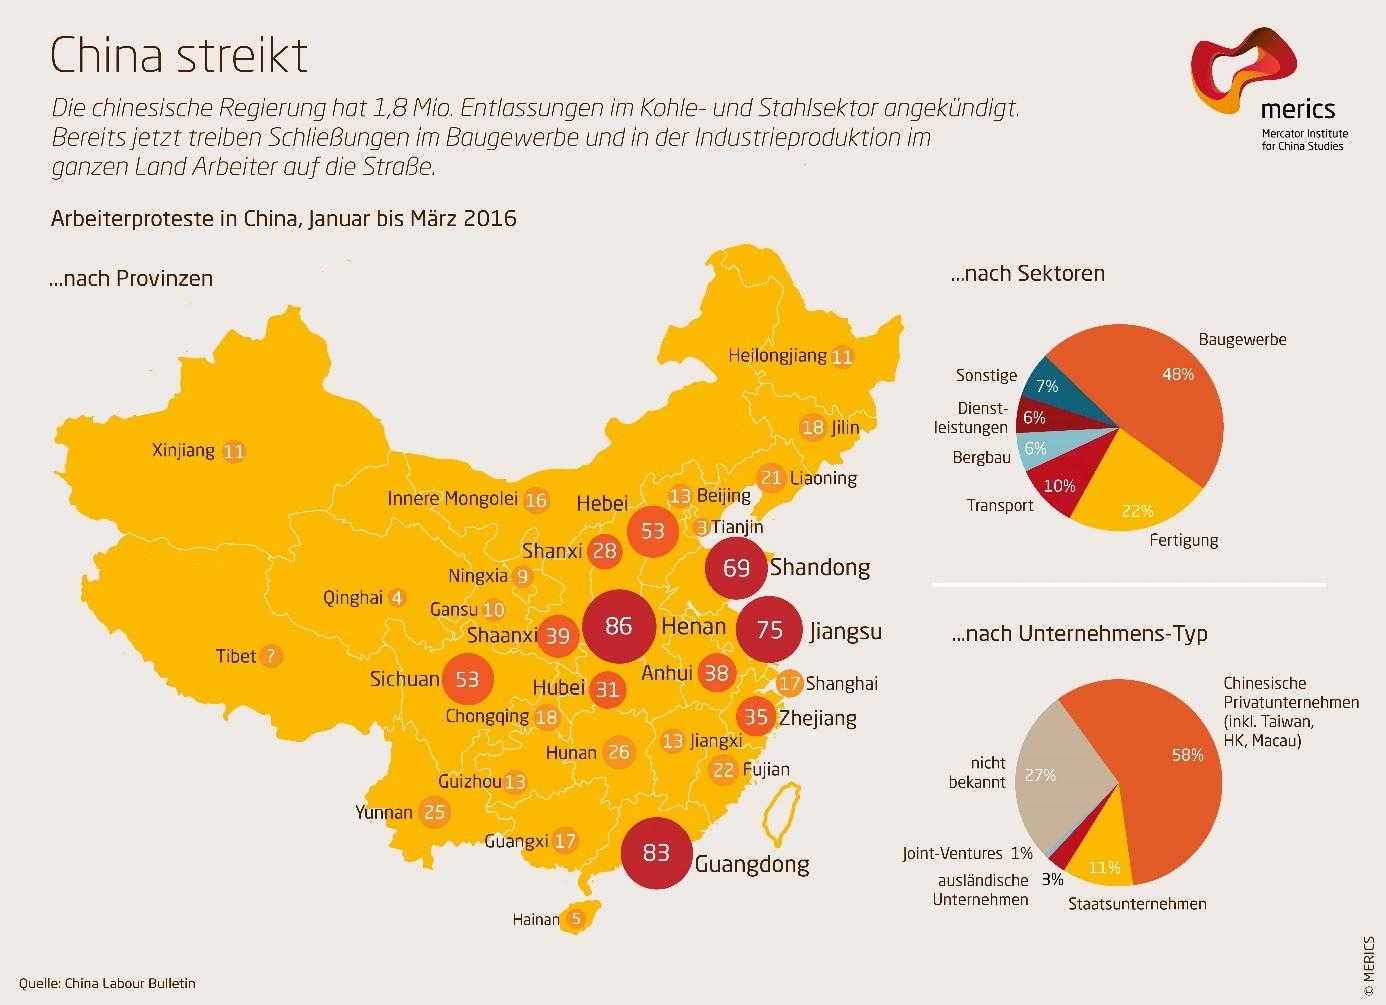 grafik merics china streikt